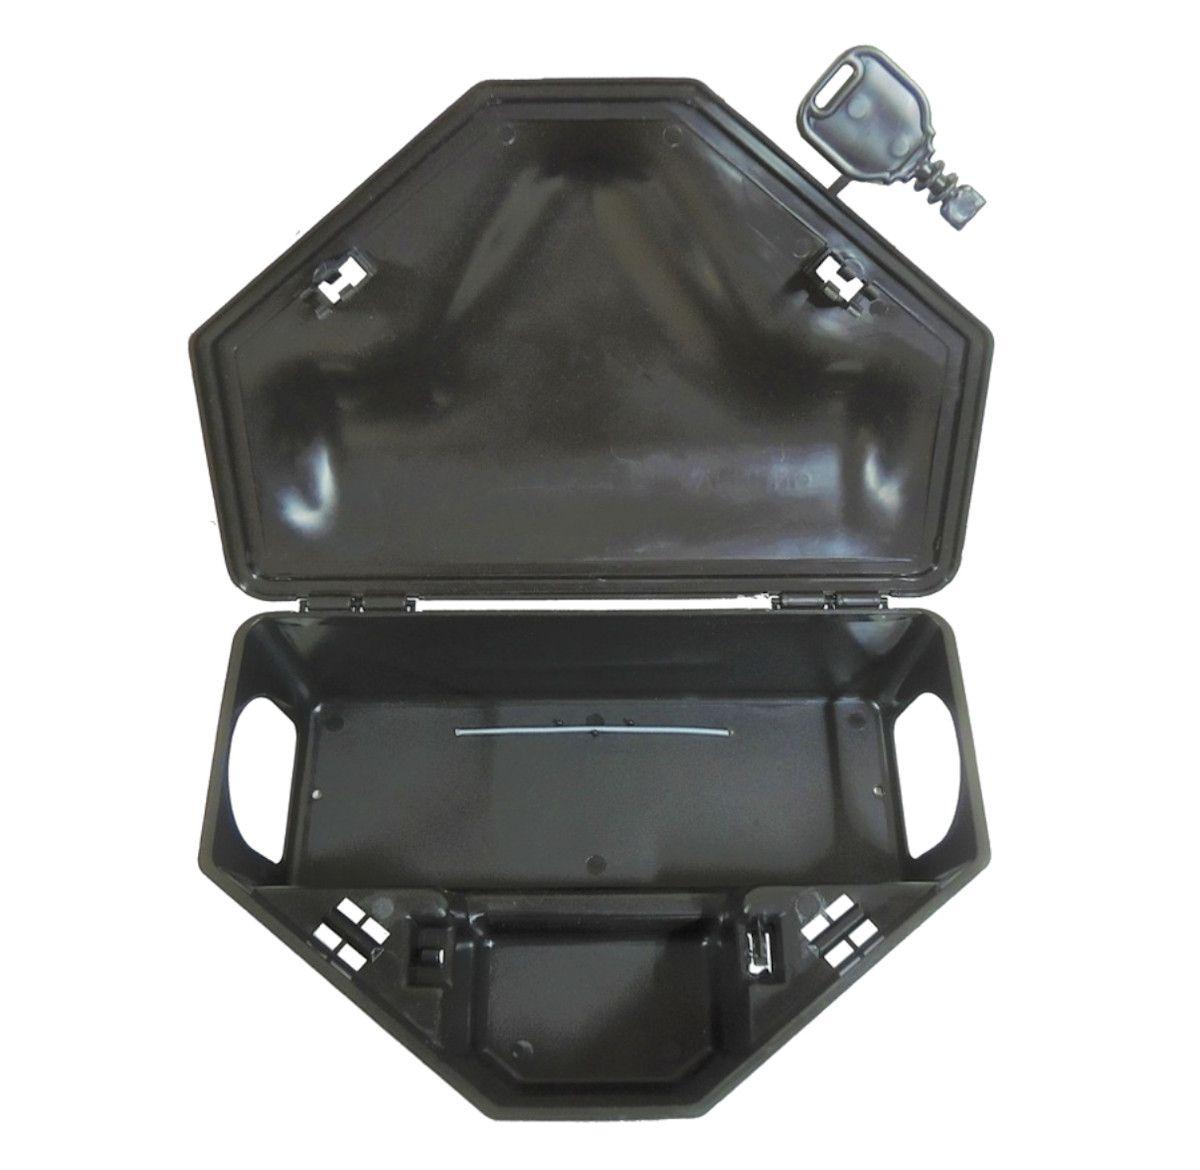 Kit 1000 Porta Isca Com Chave Para Ratos